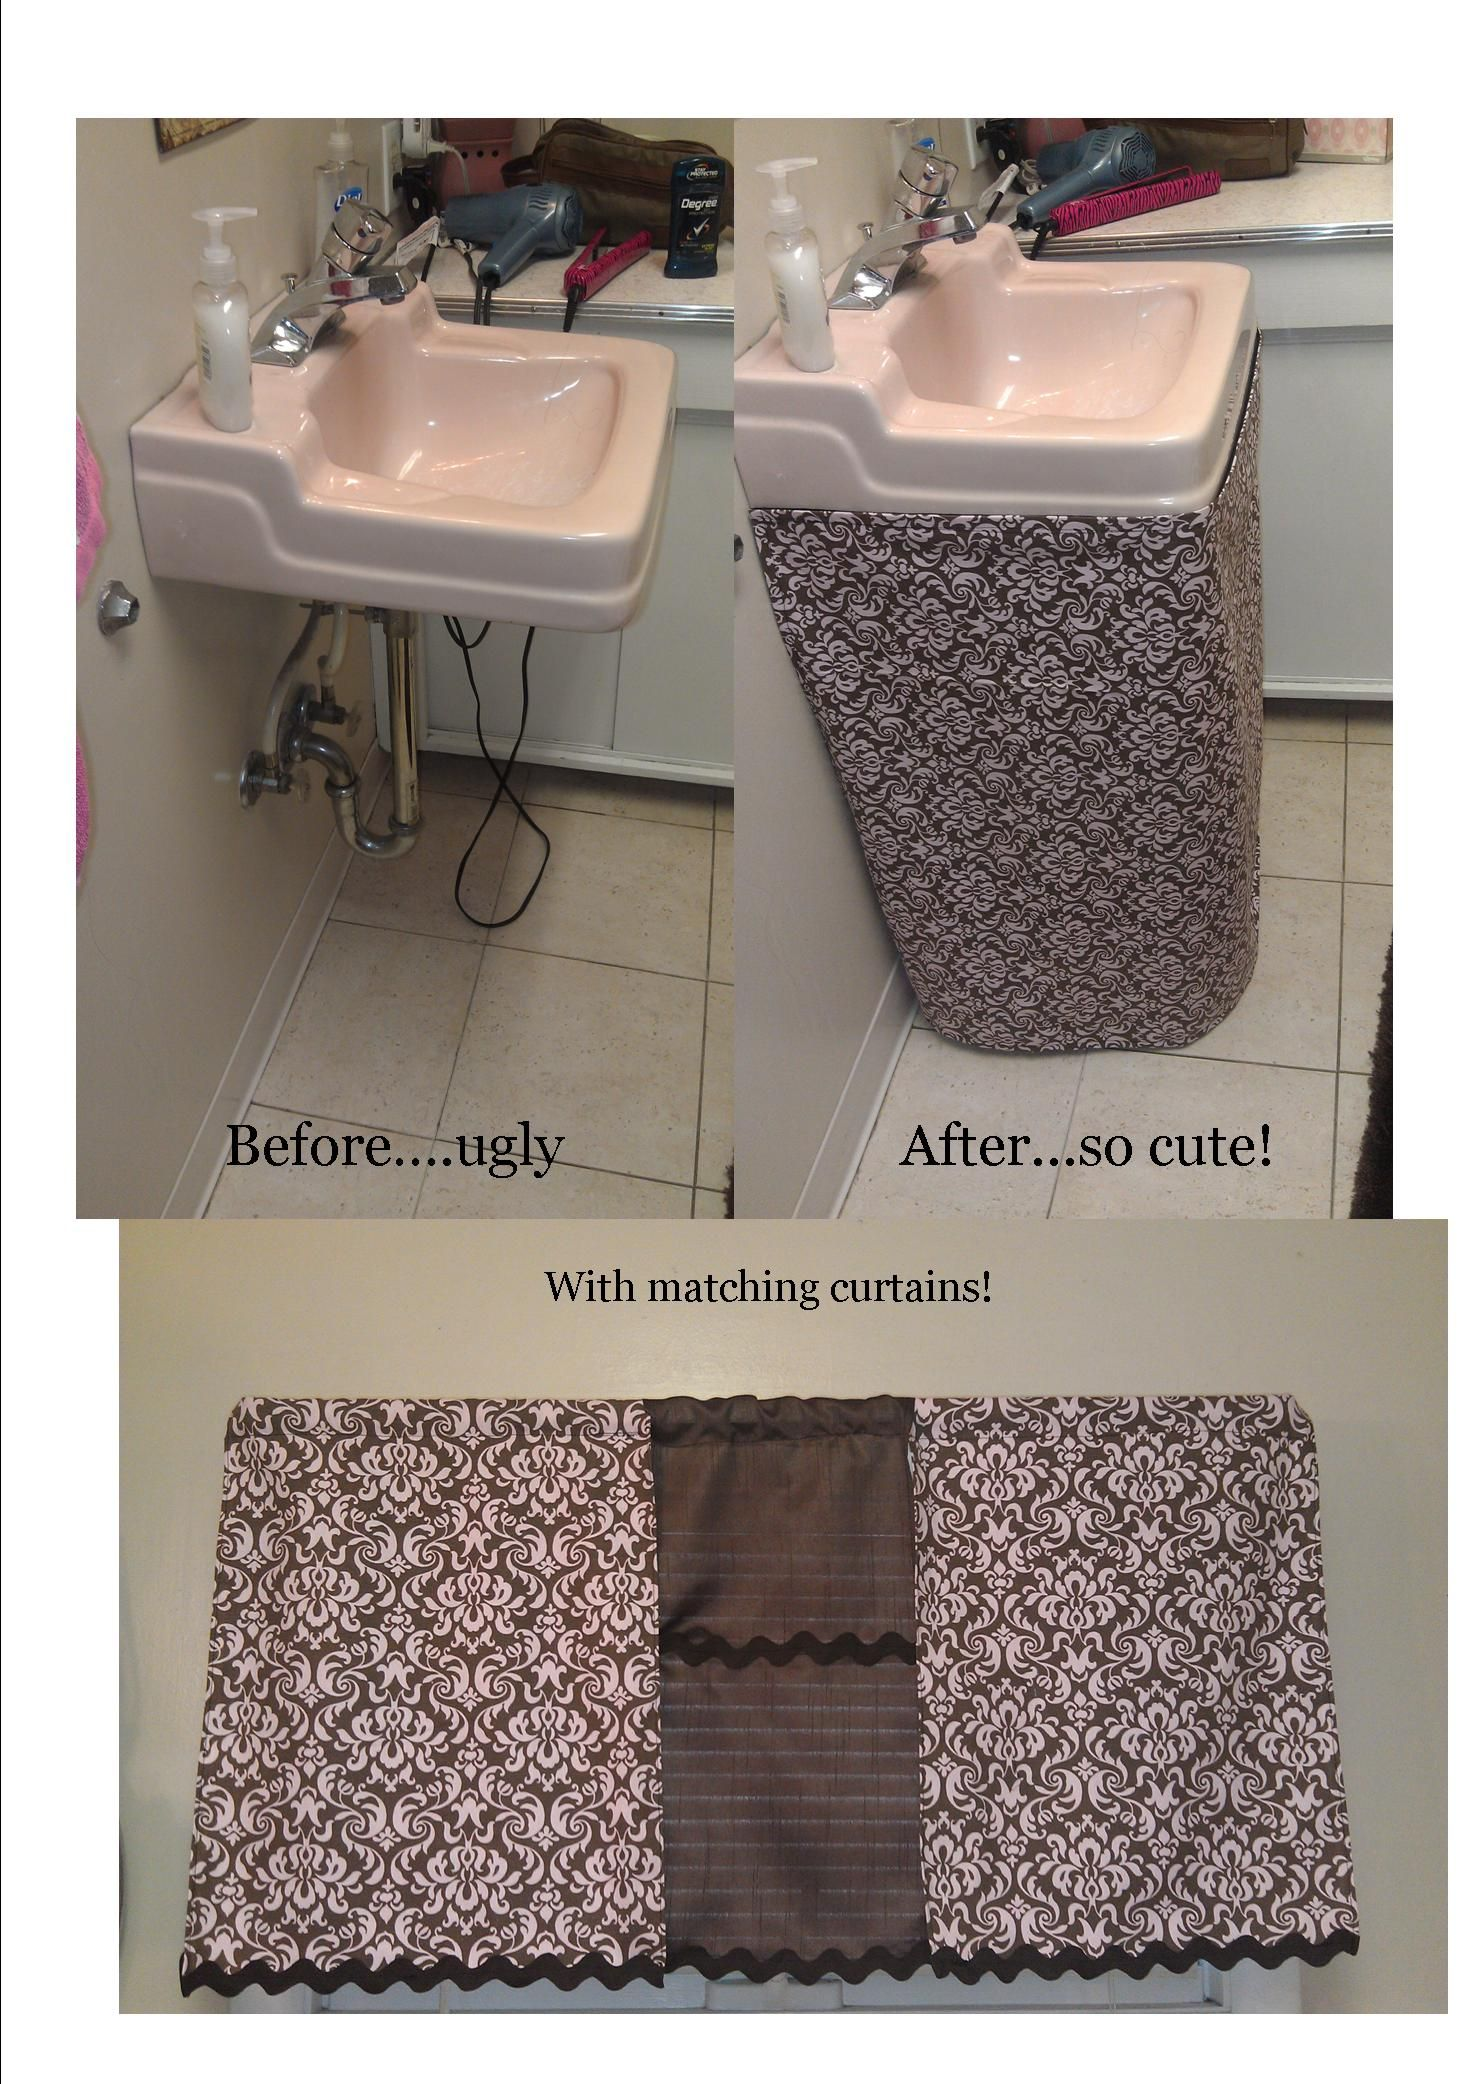 Pink And Brown Bathroom (ways To Make Bathroom Sink Look Cute/ Small  Bathroom Fix